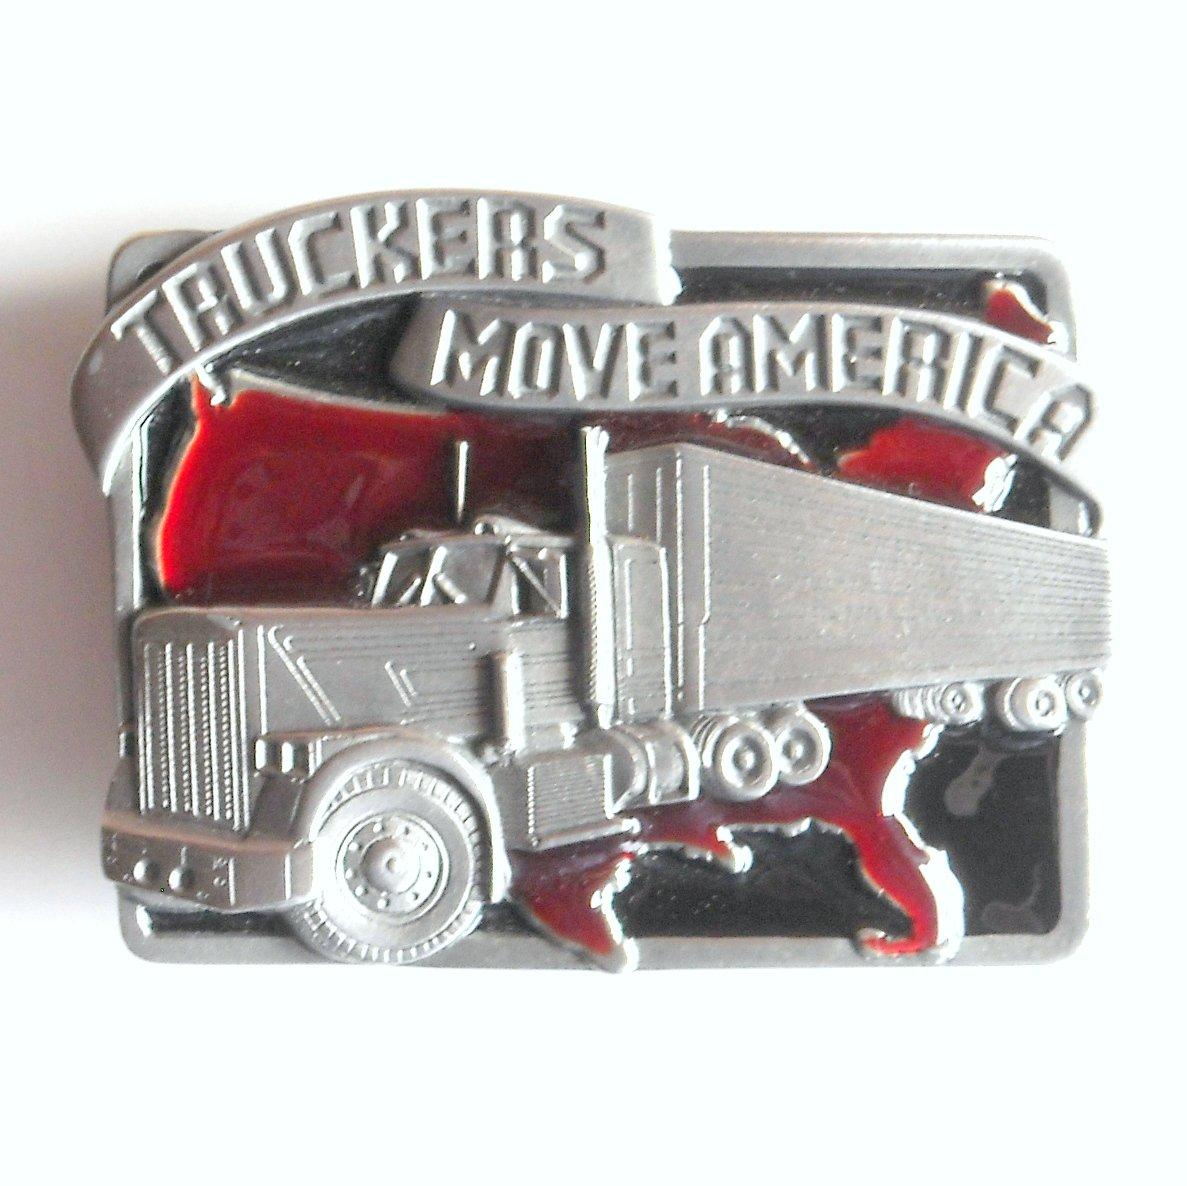 Truckers Move America 3D Siskiyou Pewter Belt Buckle